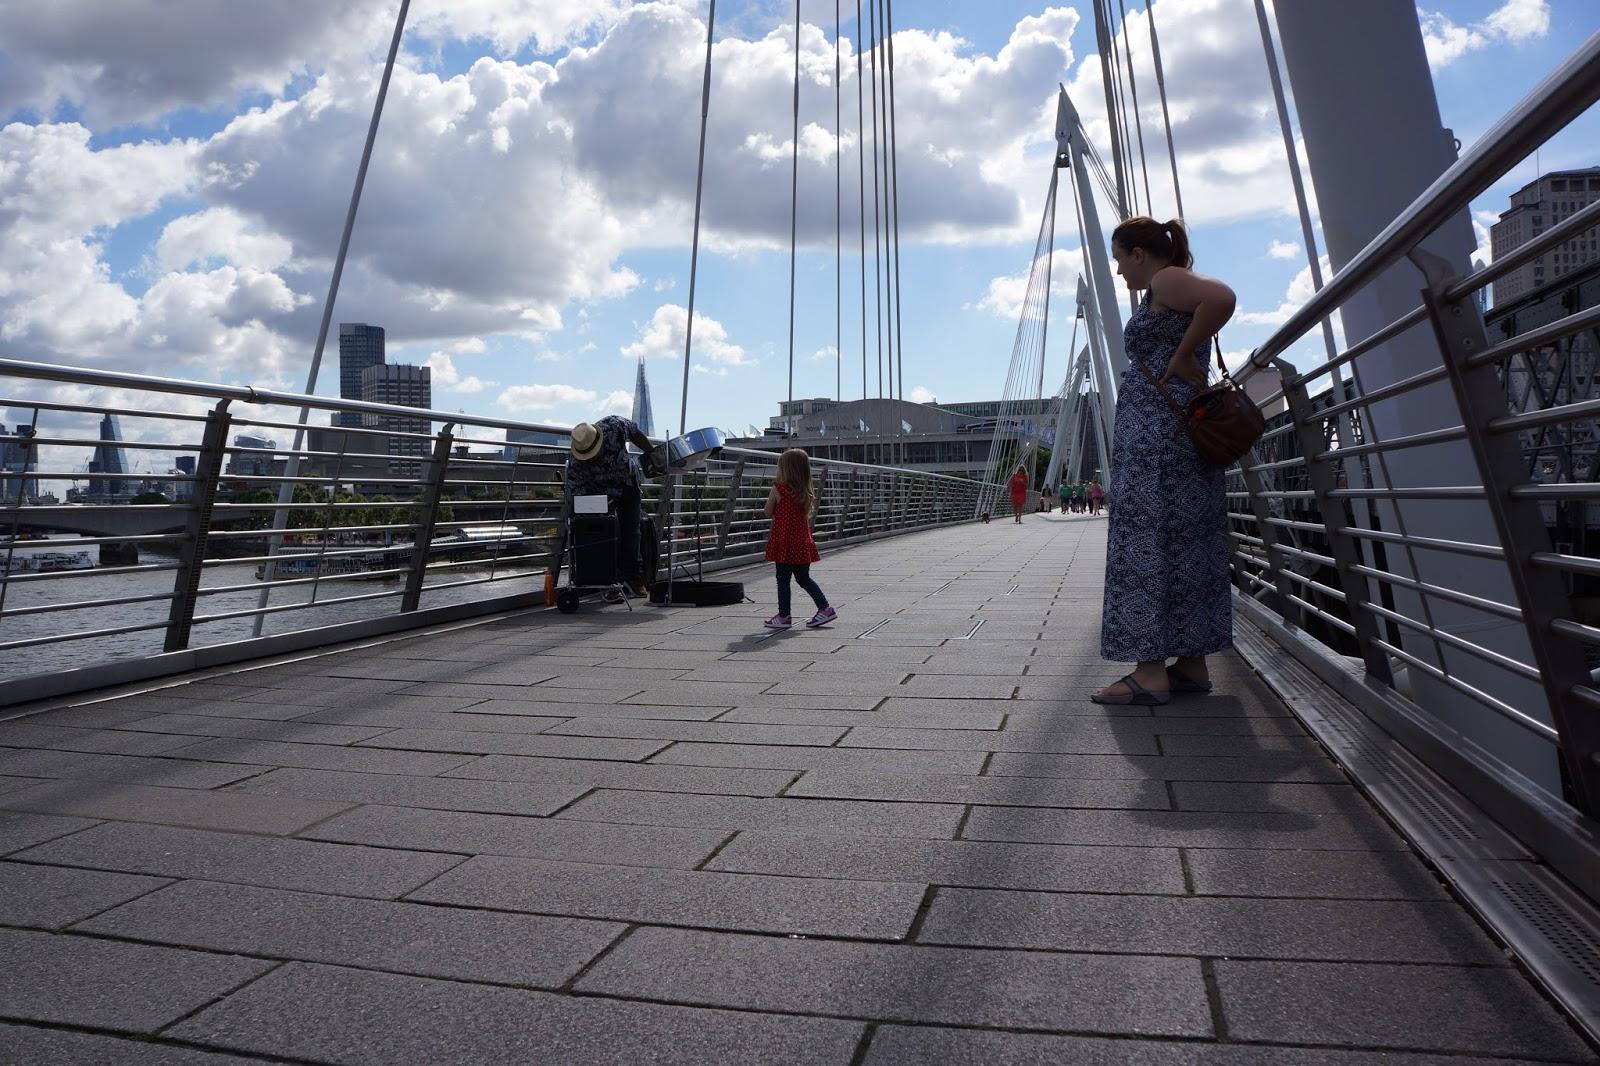 mum and daughter listening to a street performer on embankment bridge